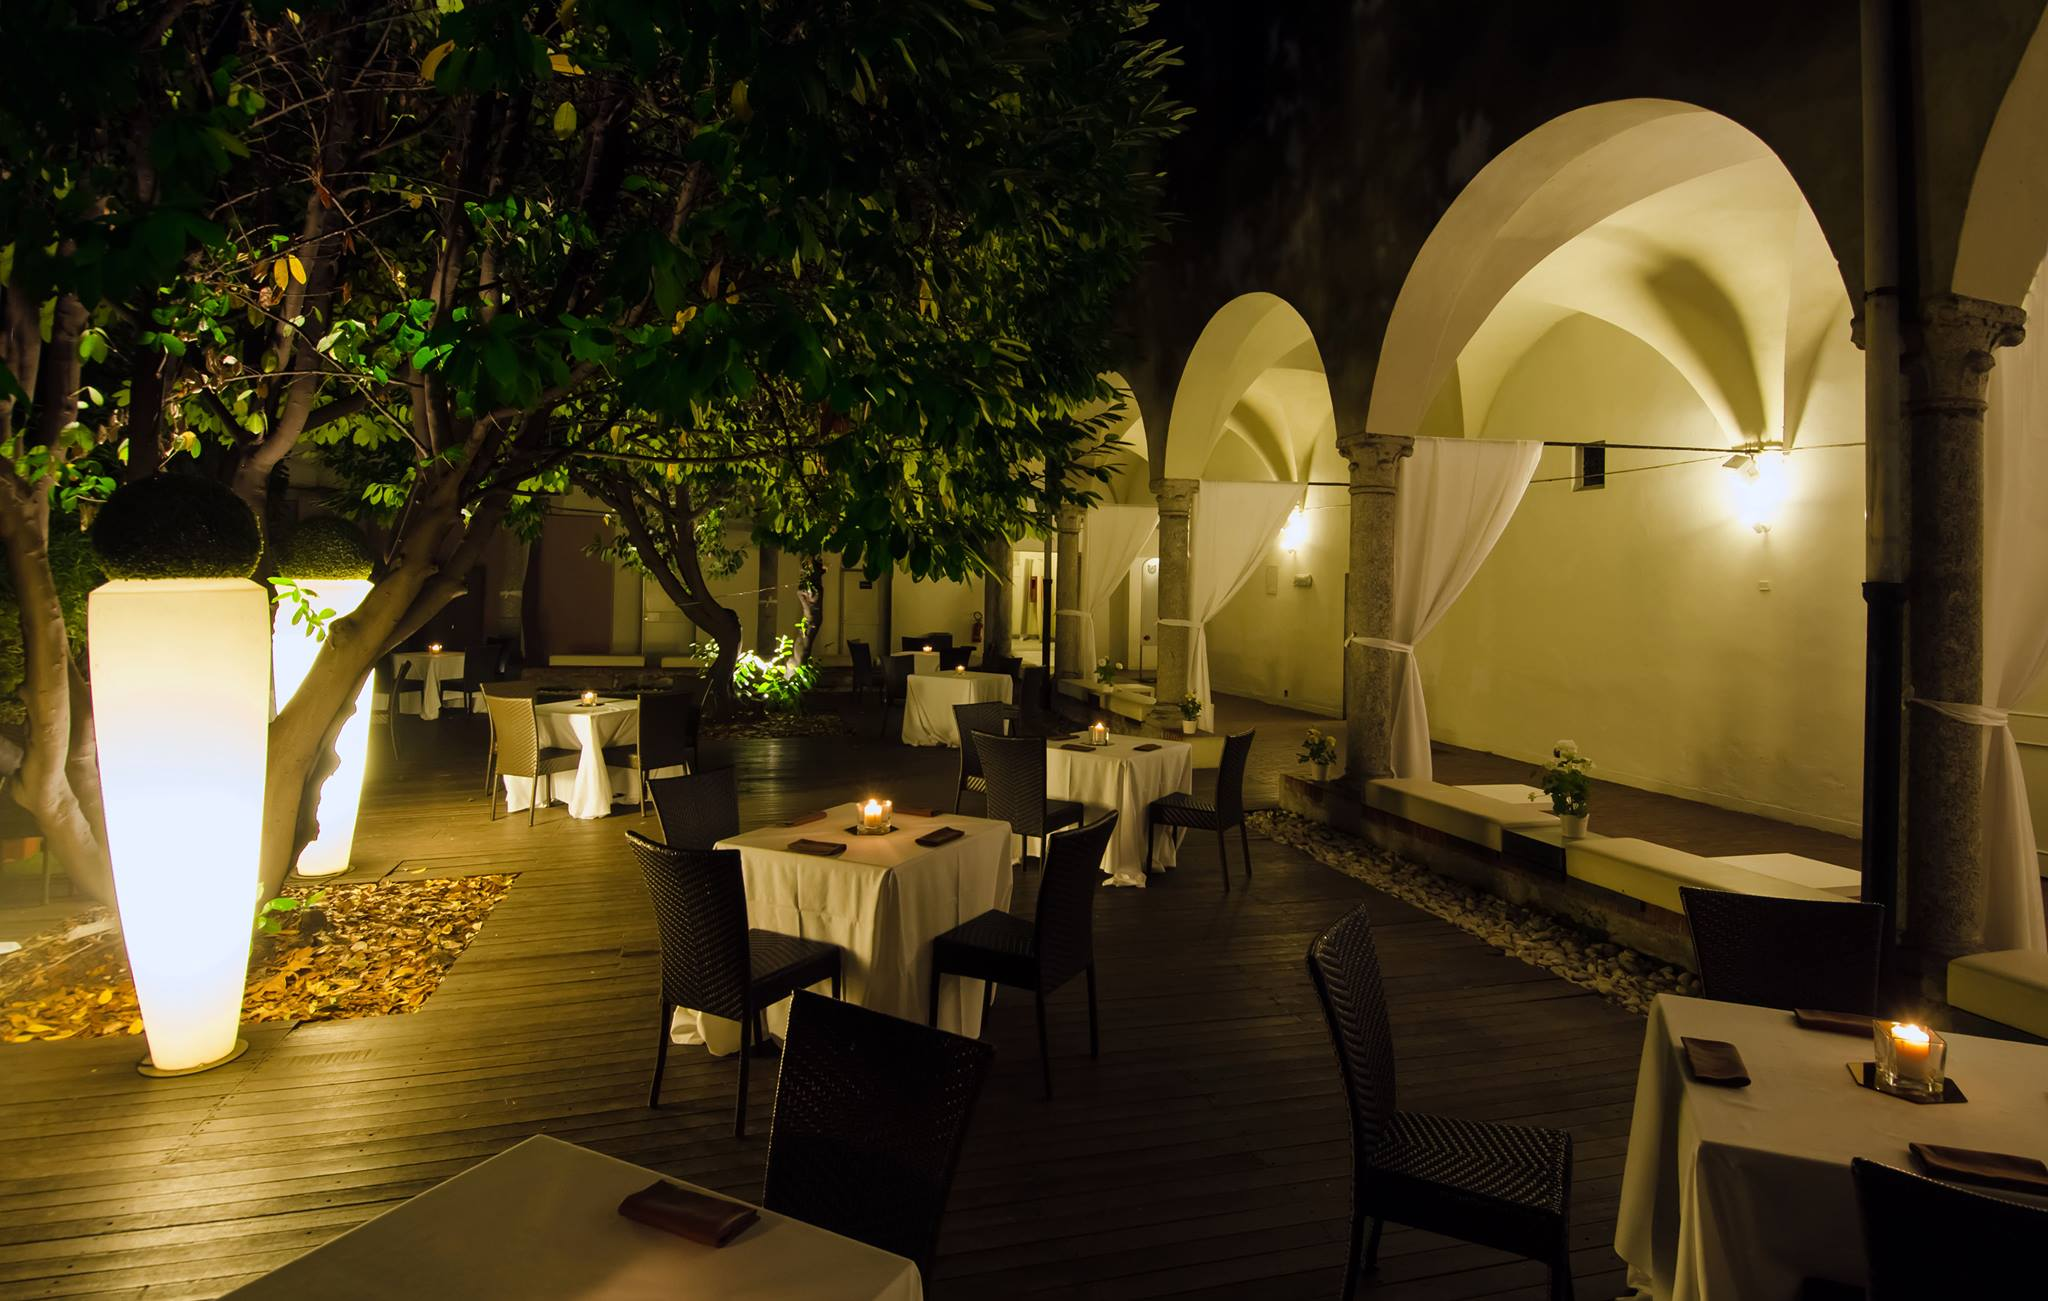 Hotel La Mela Via Alebandro Stoppato  Roma